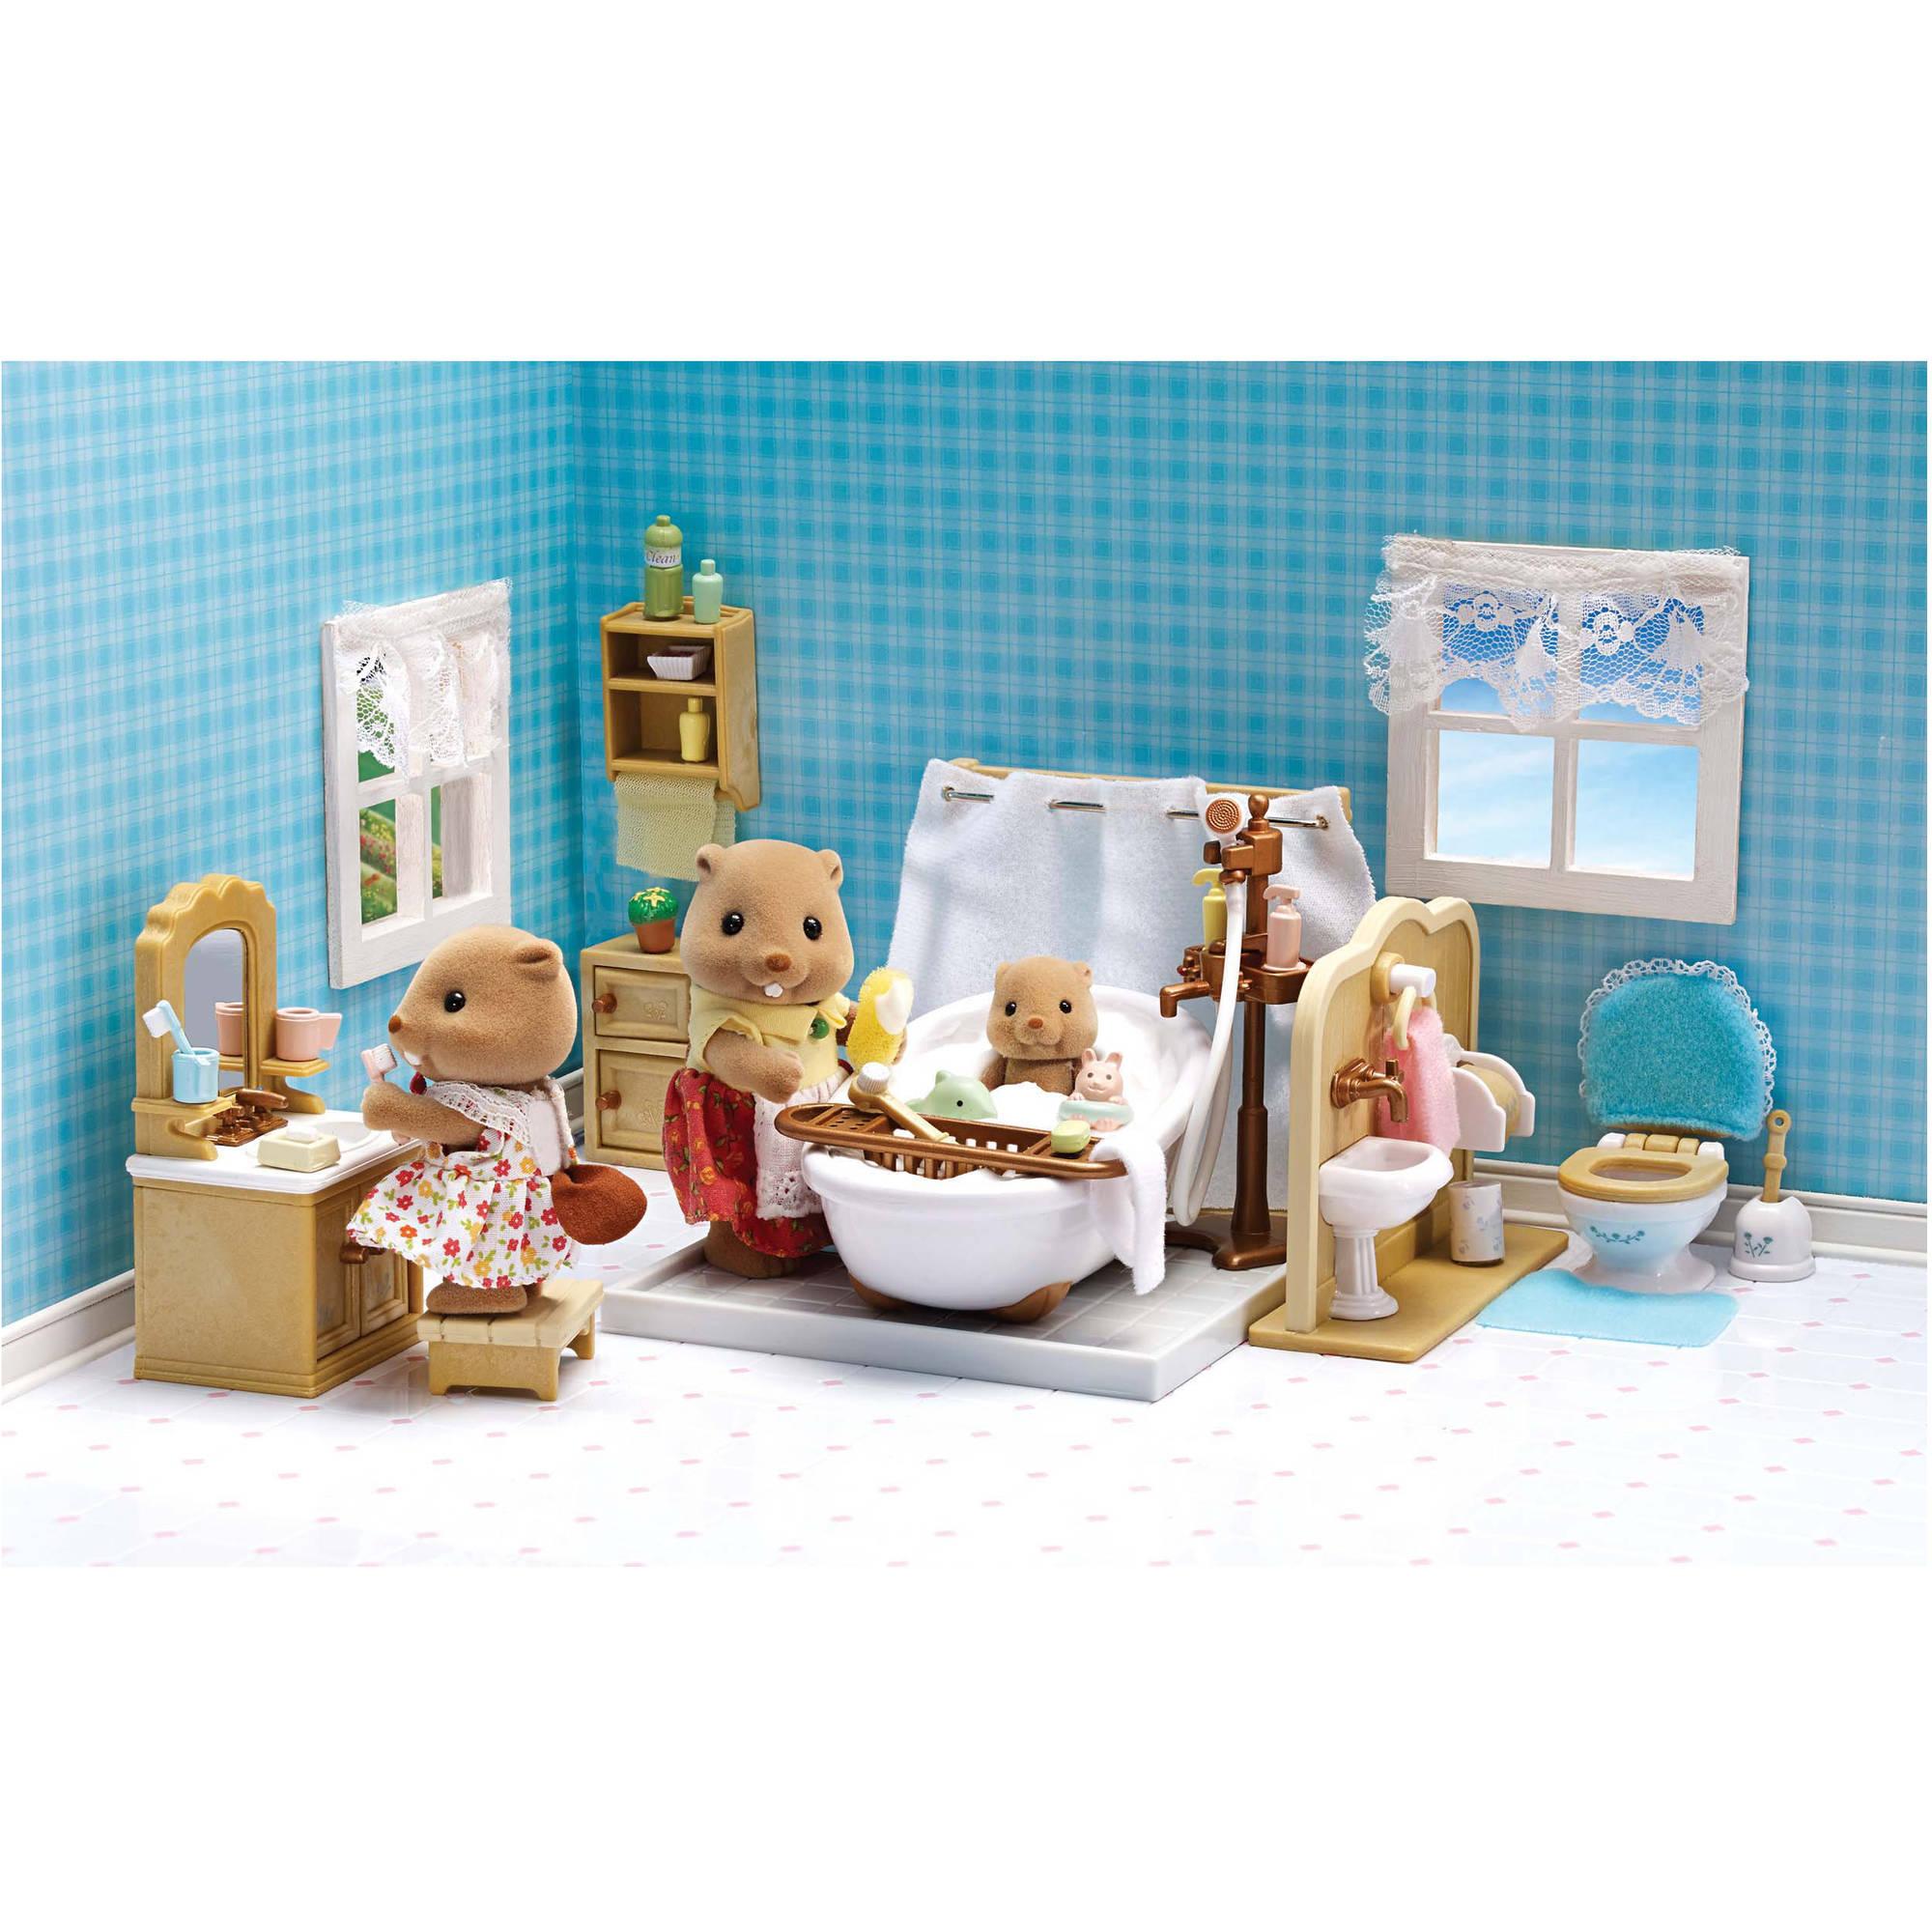 Calico Critters Deluxe Bathroom Set - Walmart.com